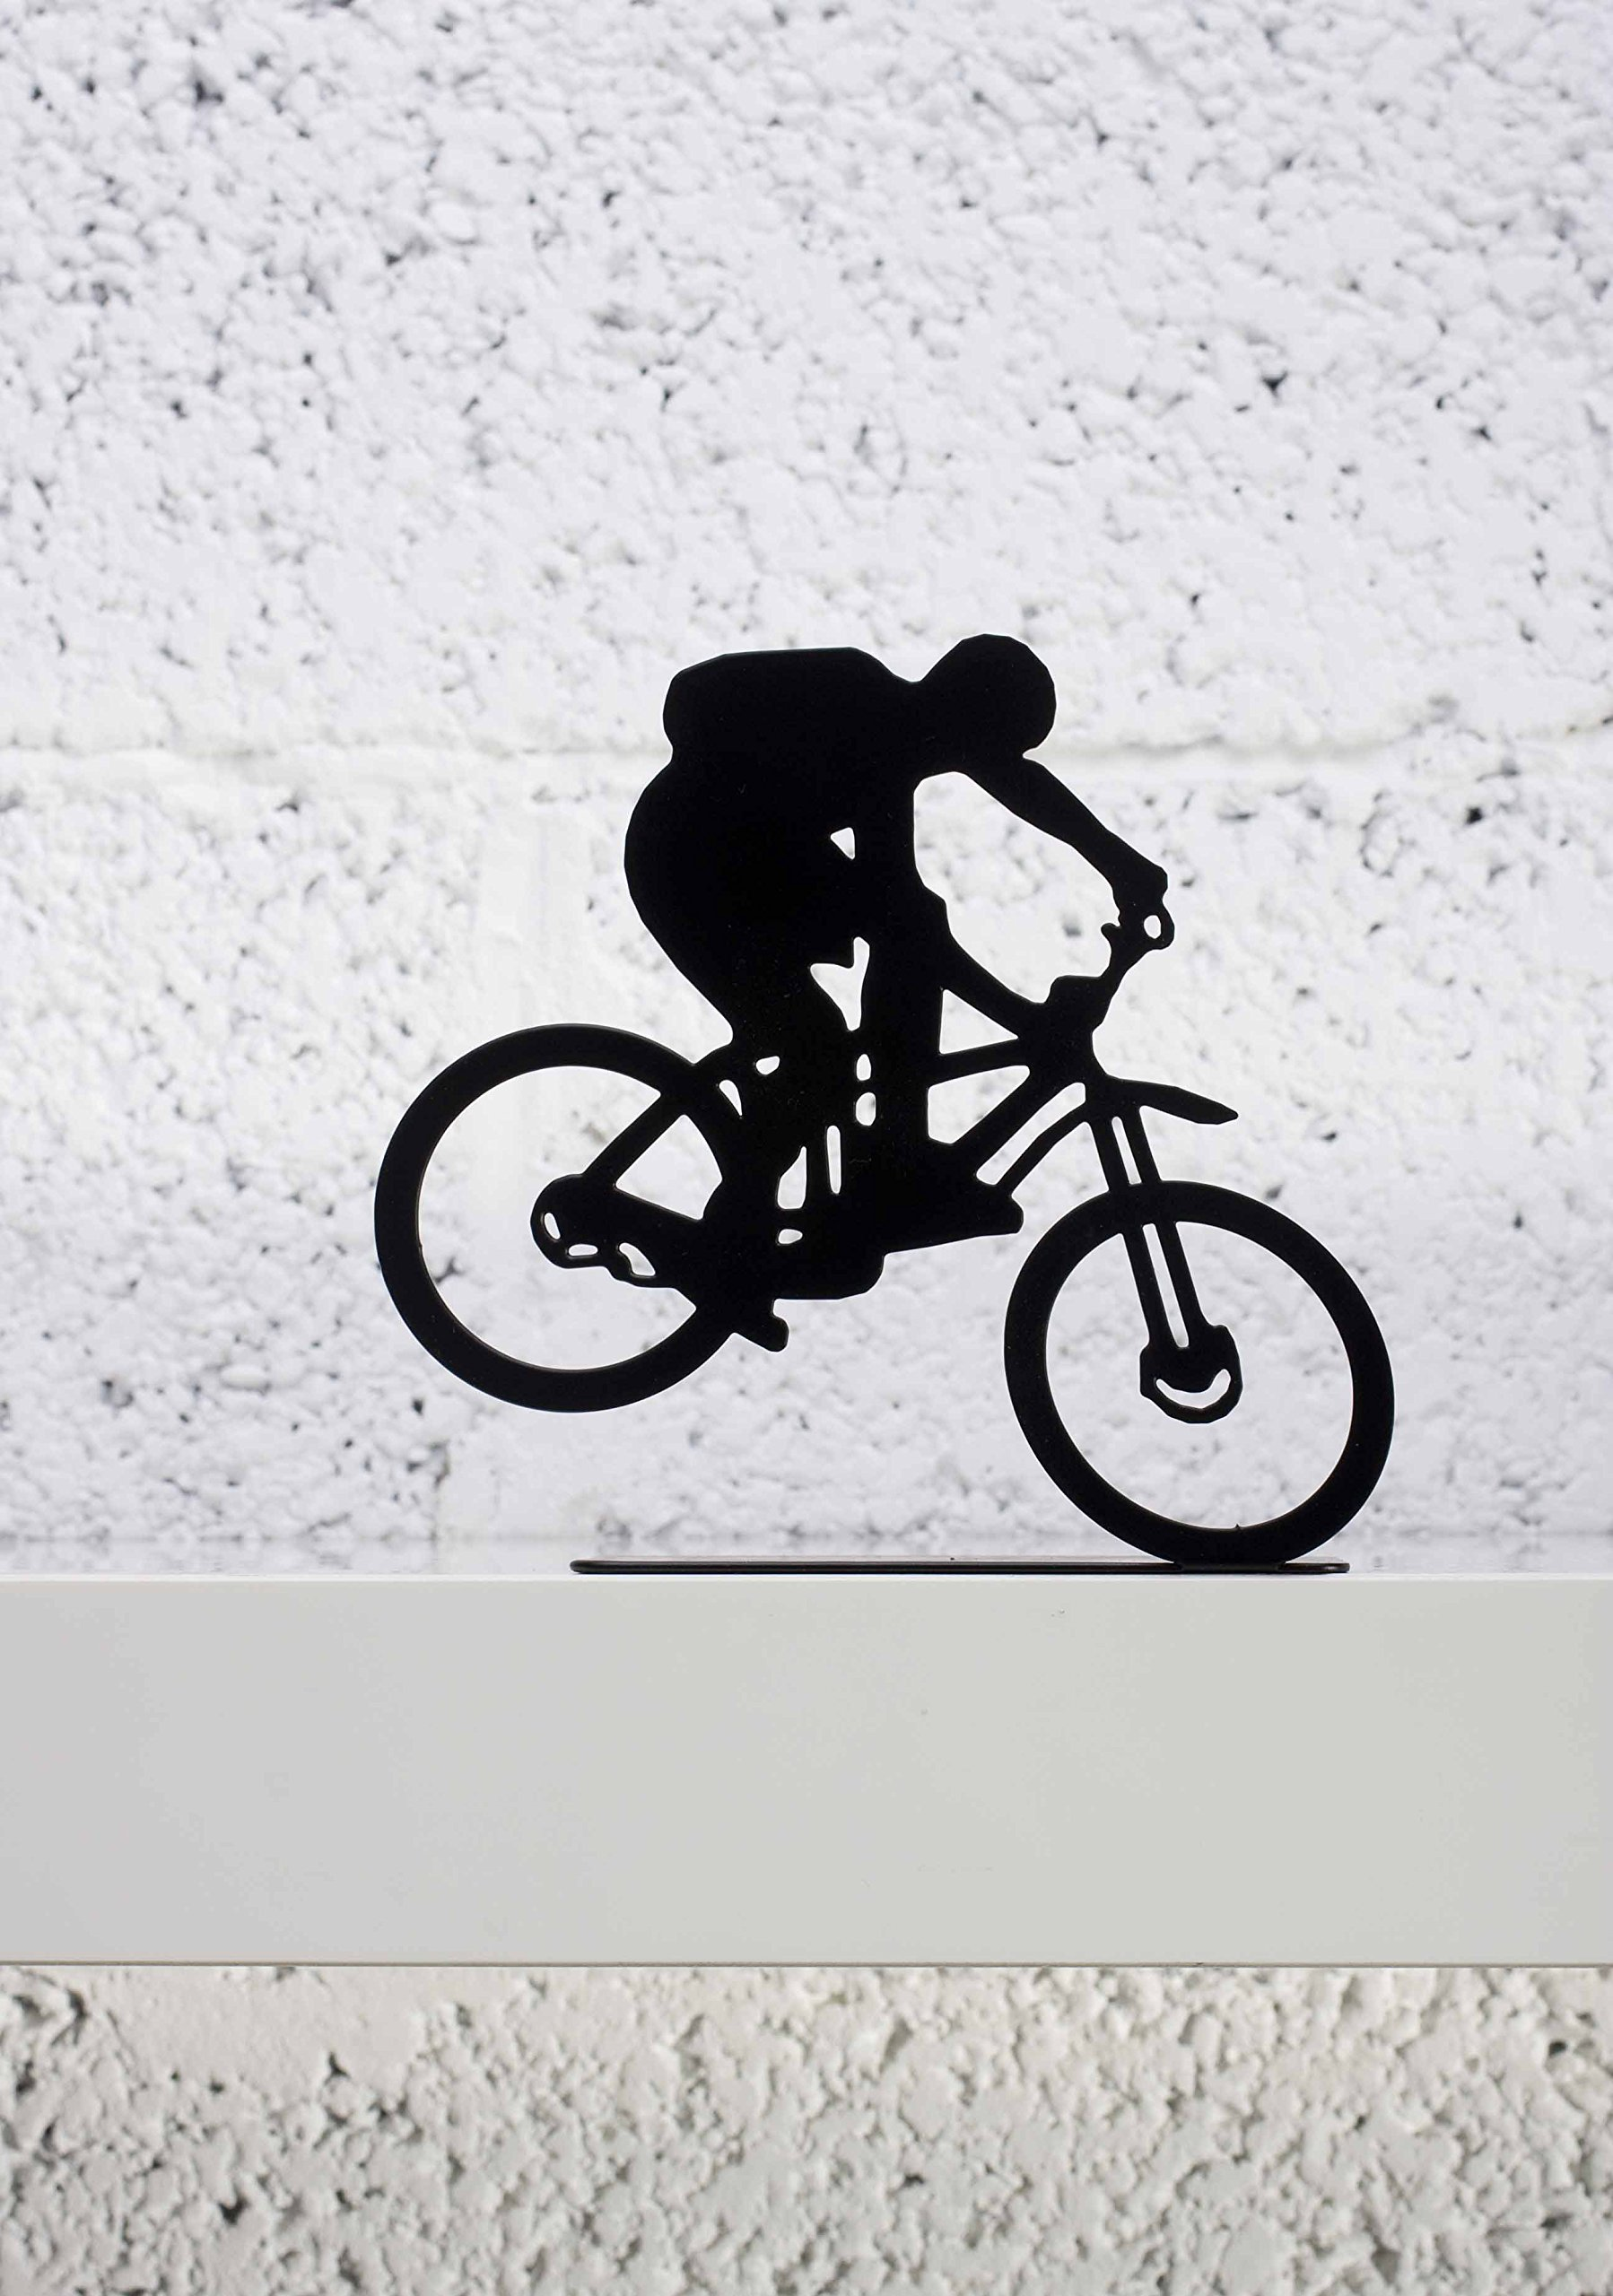 ARTORI Design Extreme Bike Rider - black metal figurine for shelf decoration by ARTORI Design